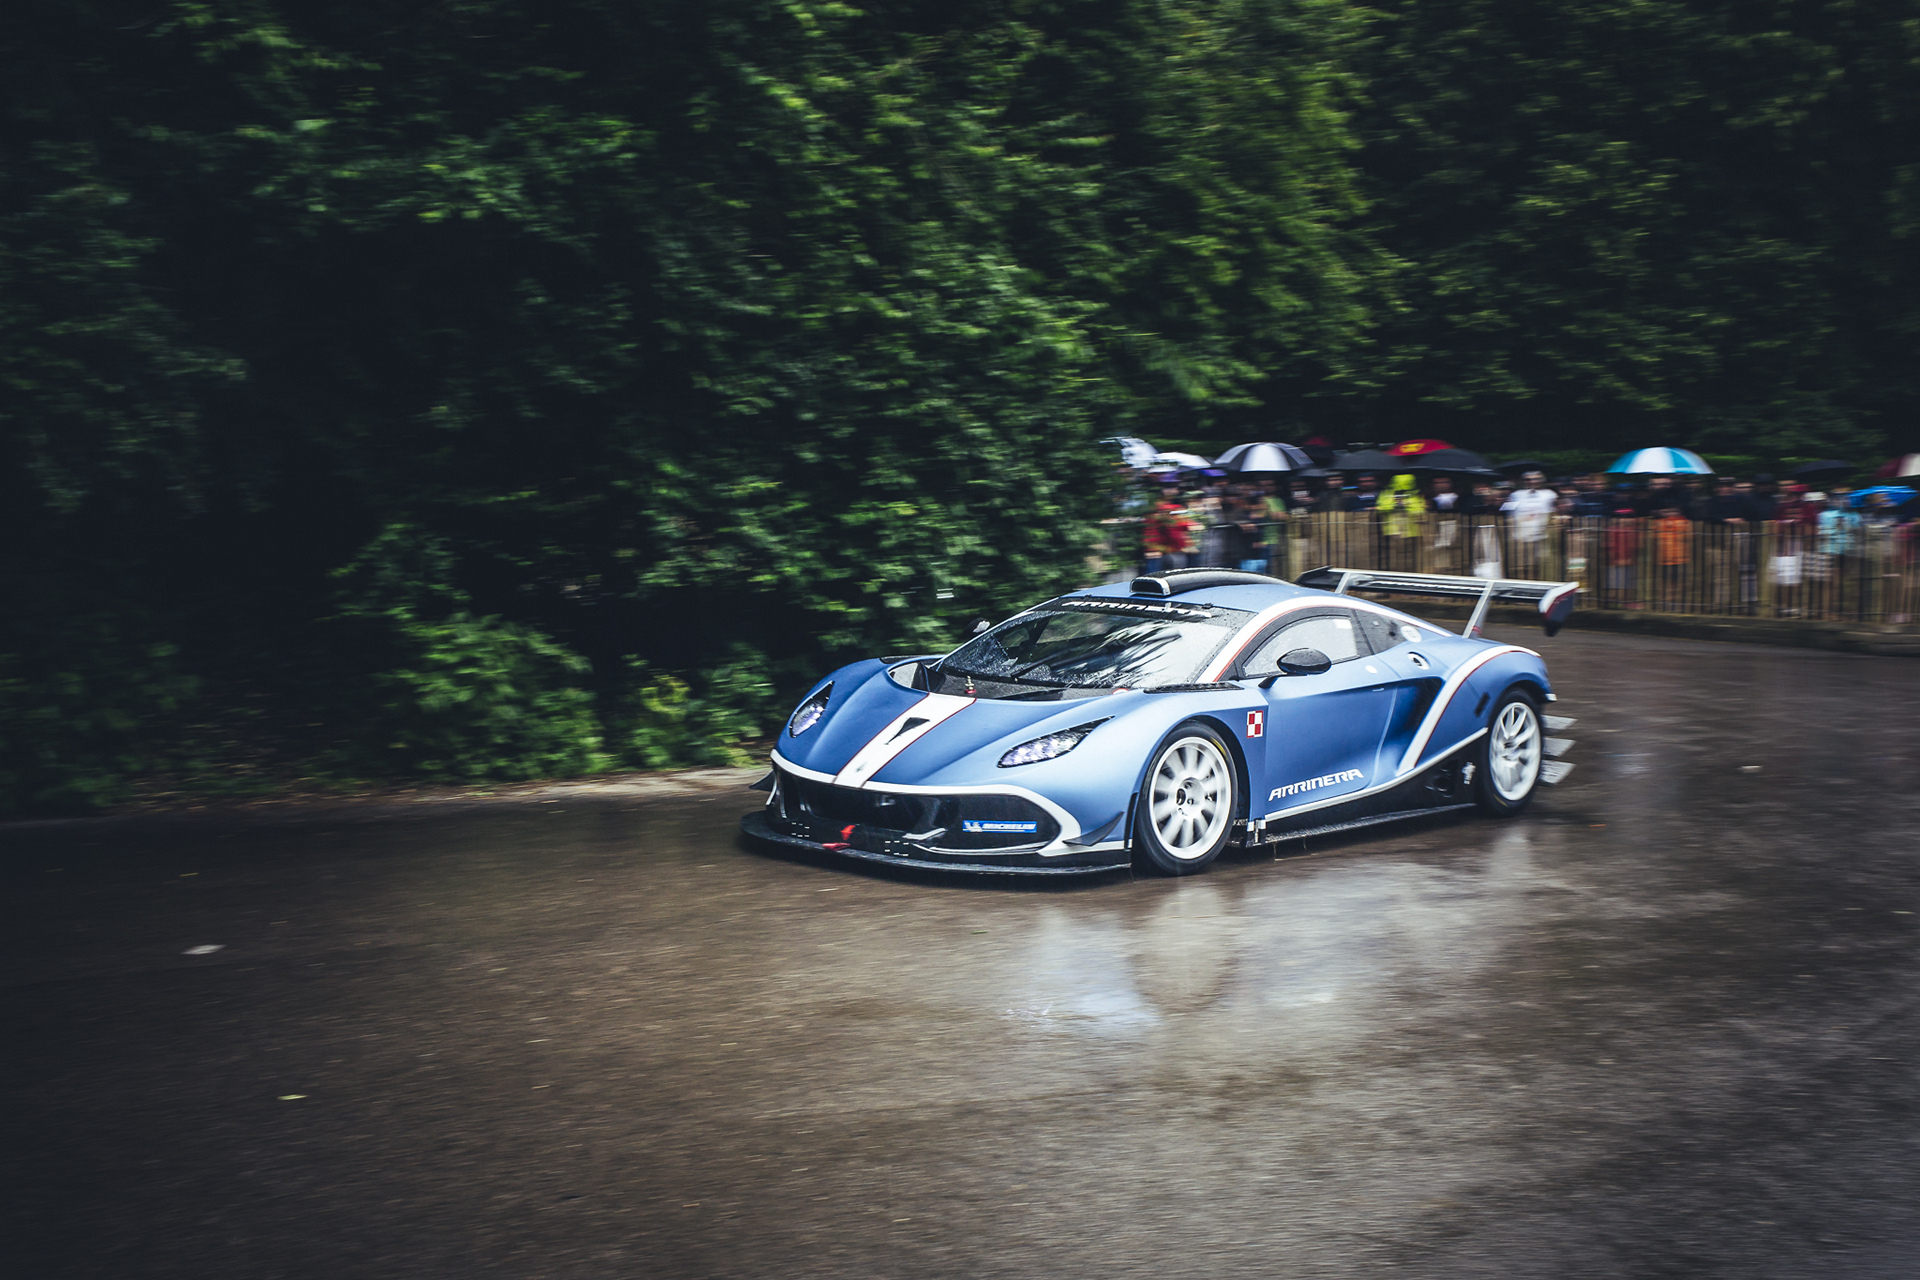 Arrinera at Goodwood © Arrinera Racing Ltd.